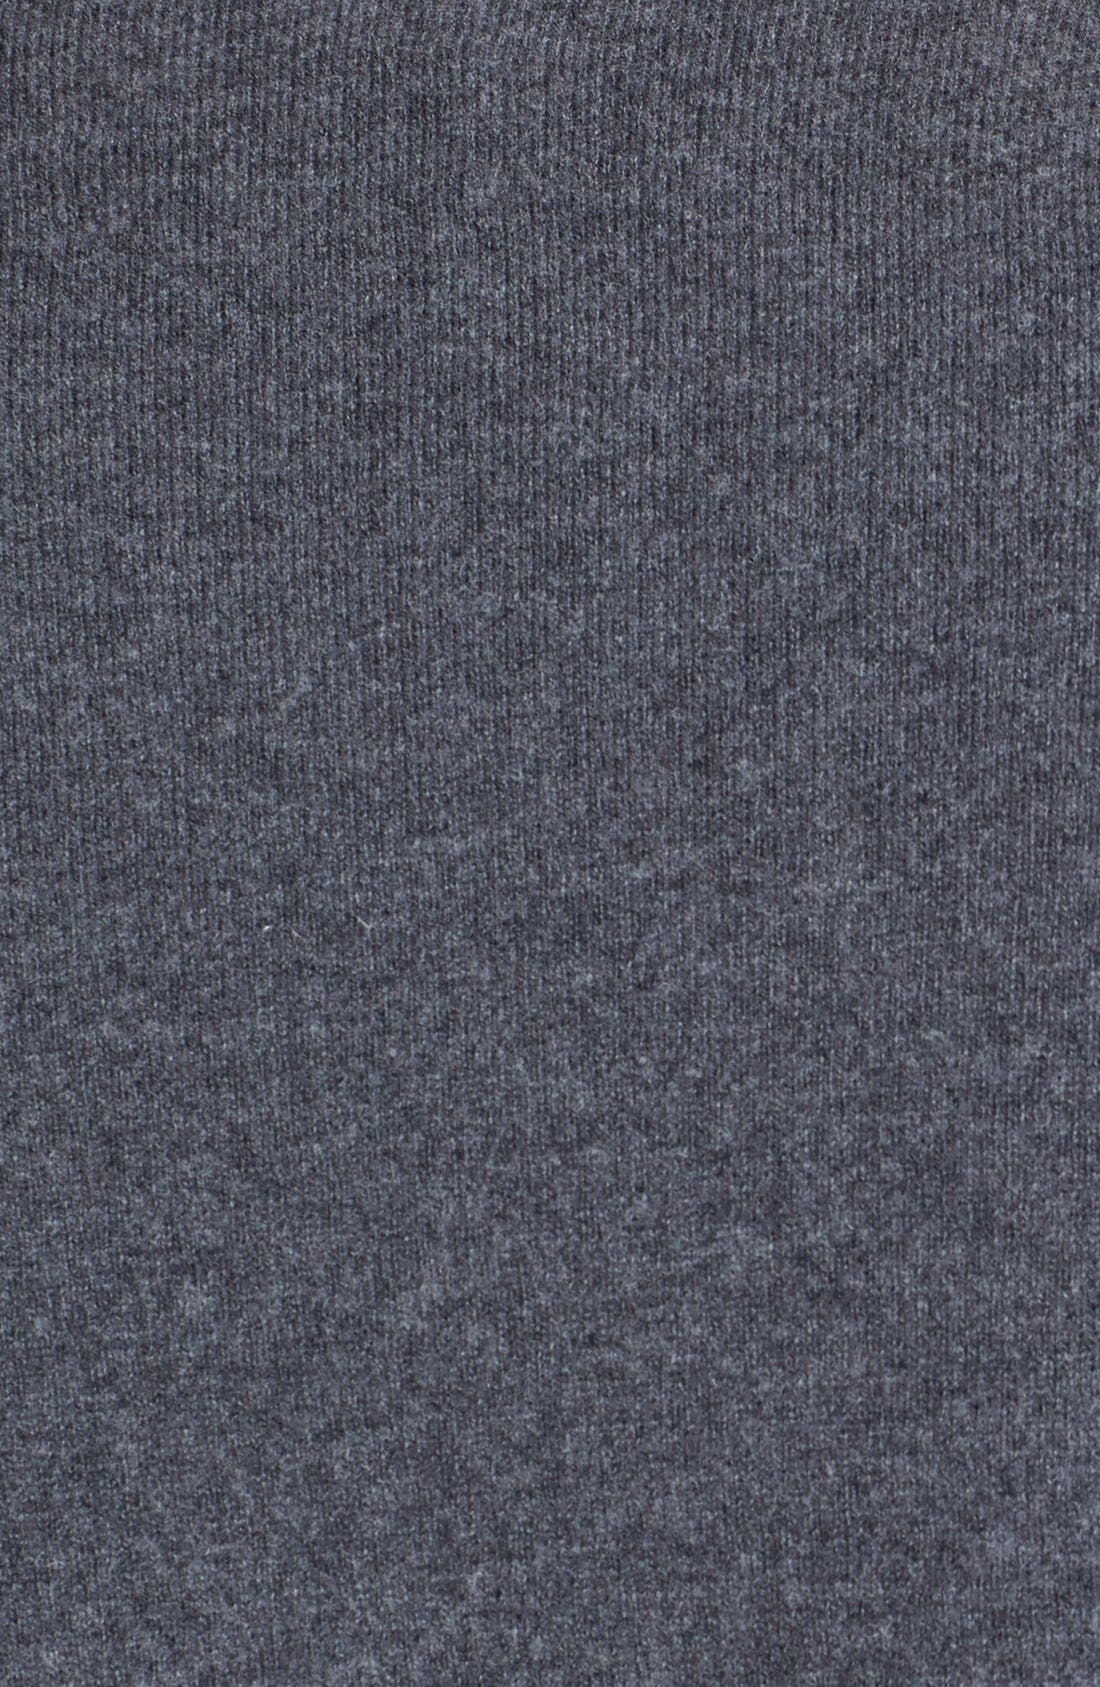 Alternate Image 3  - Cutter & Buck 'Lake Union' V-Neck Sweater